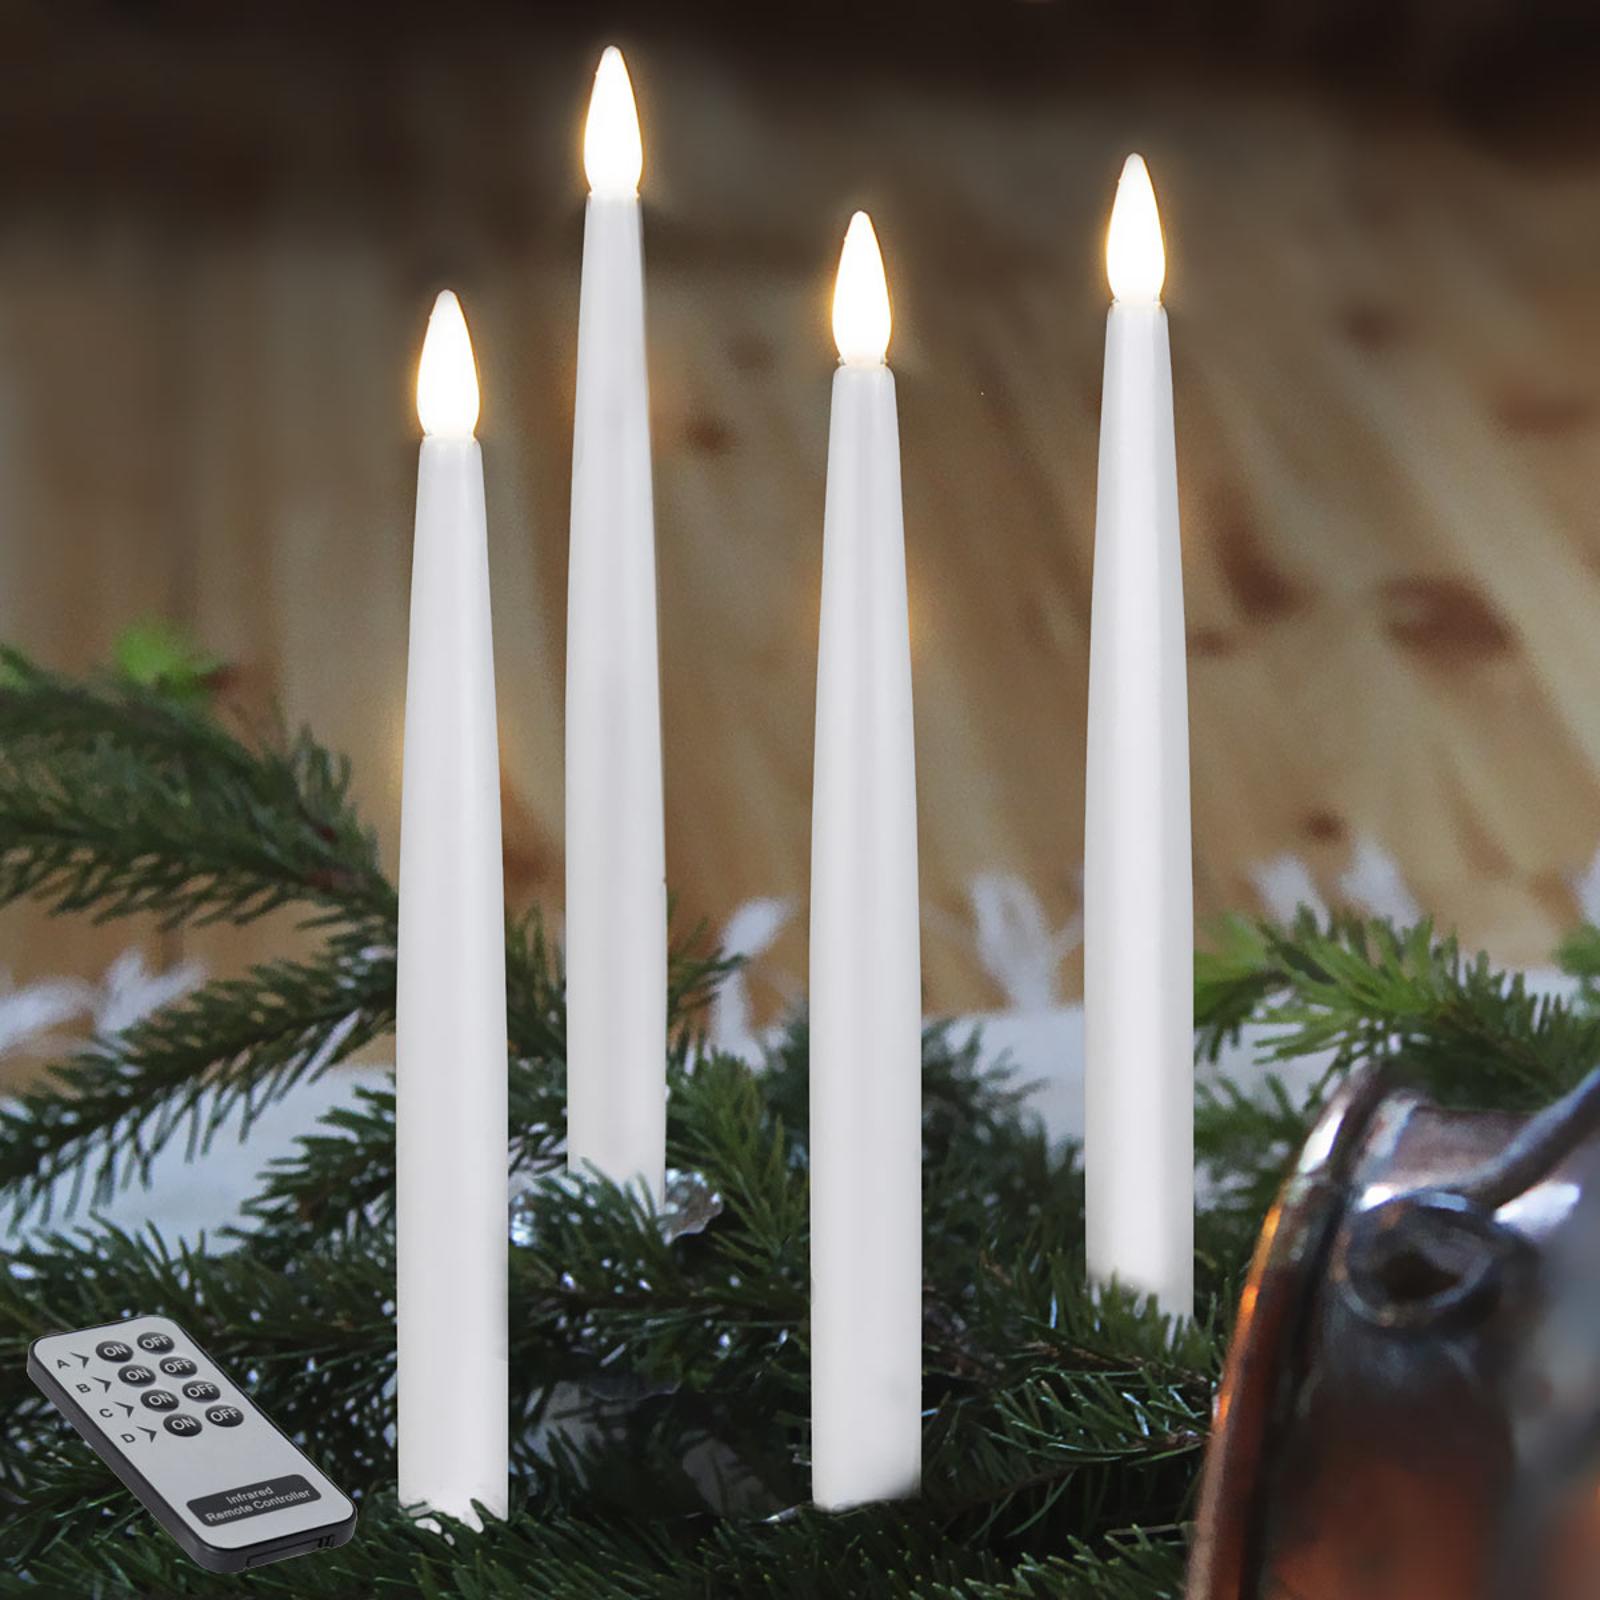 Candele natalizie LED da interni, set da 4